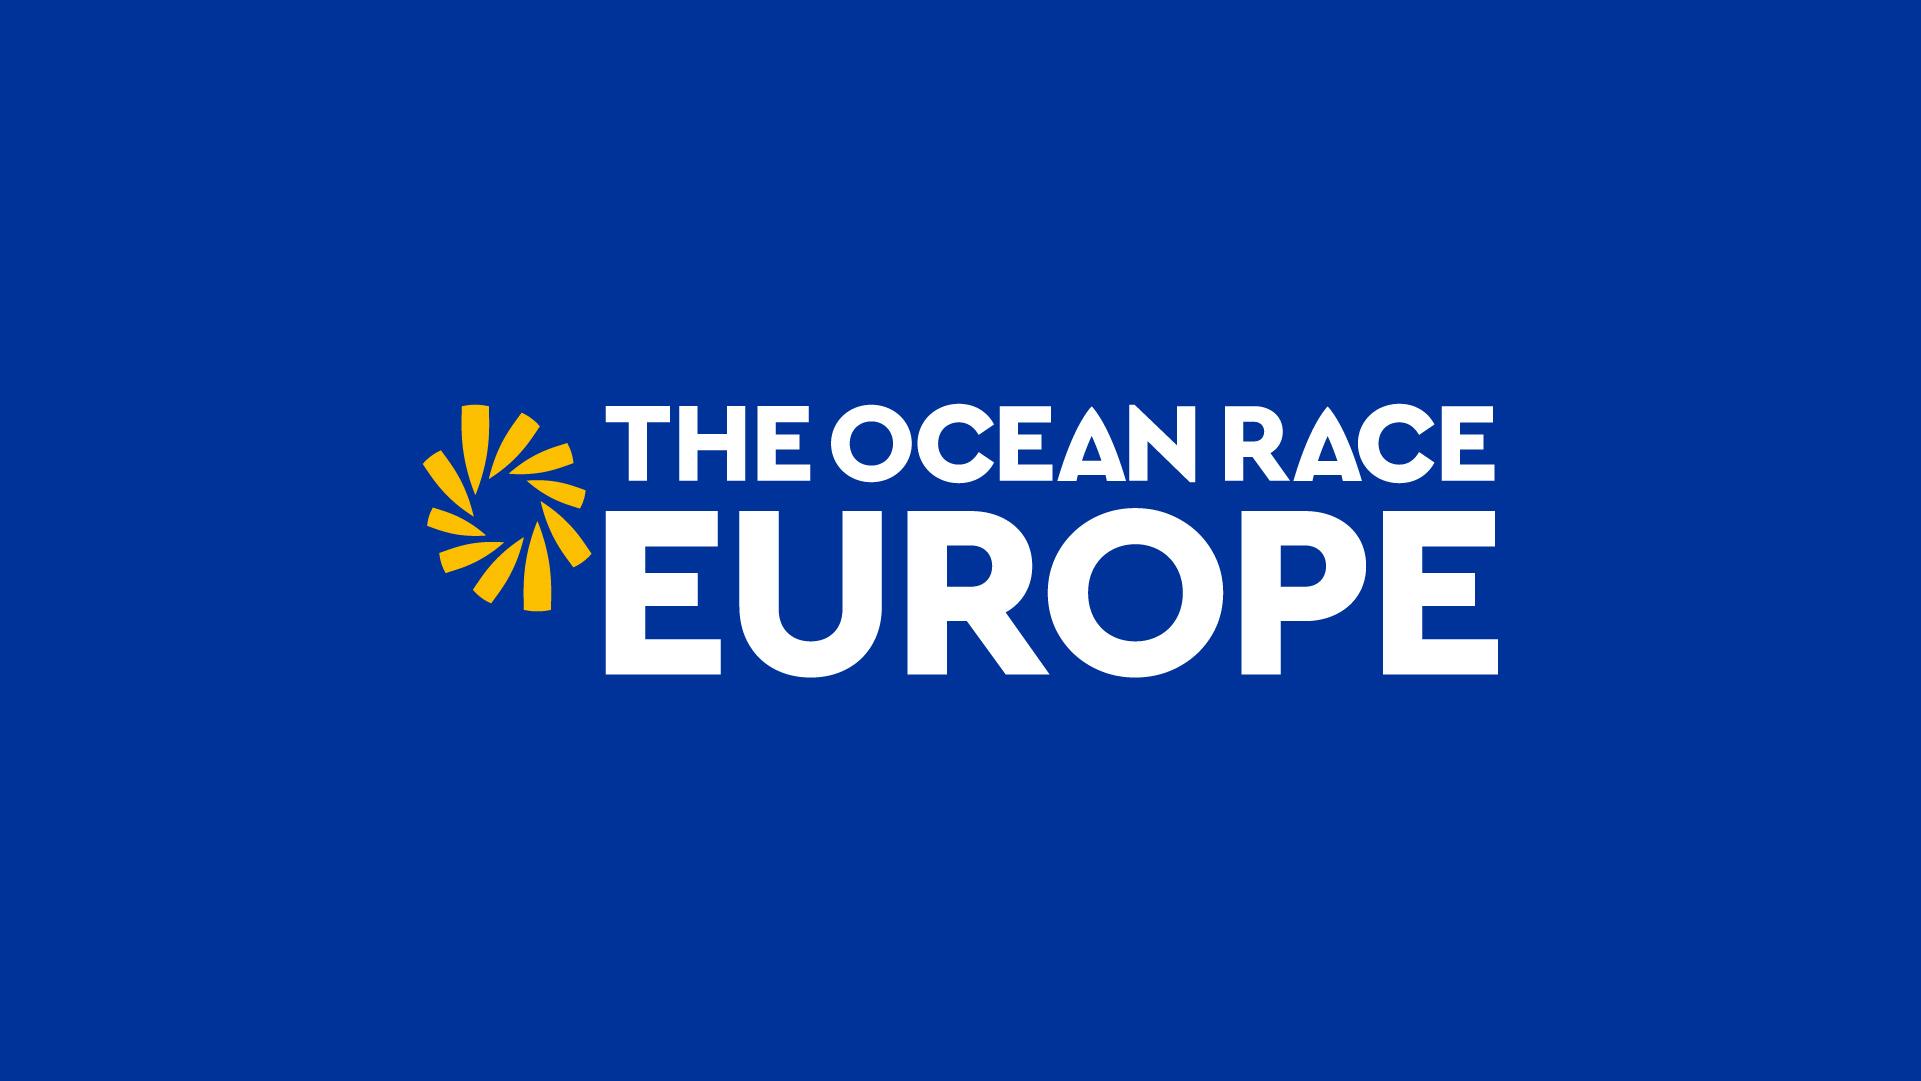 The Ocean Race